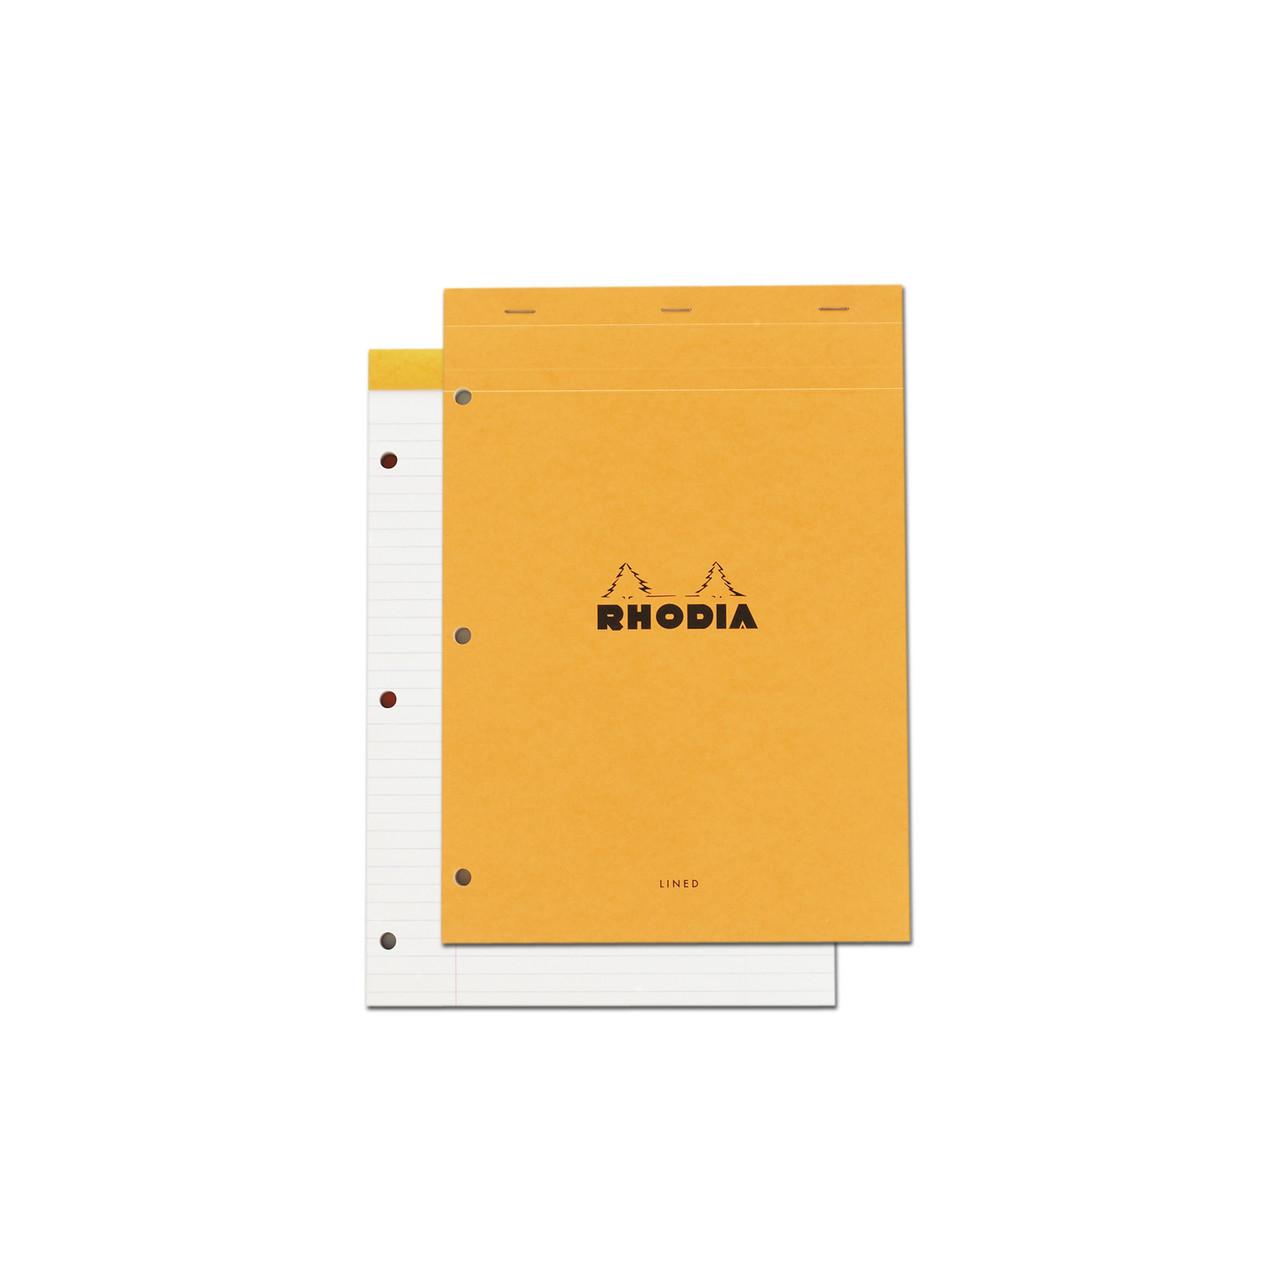 Rhodia Pad N° 18 8.25x11.75 3-Hole Lined Orange